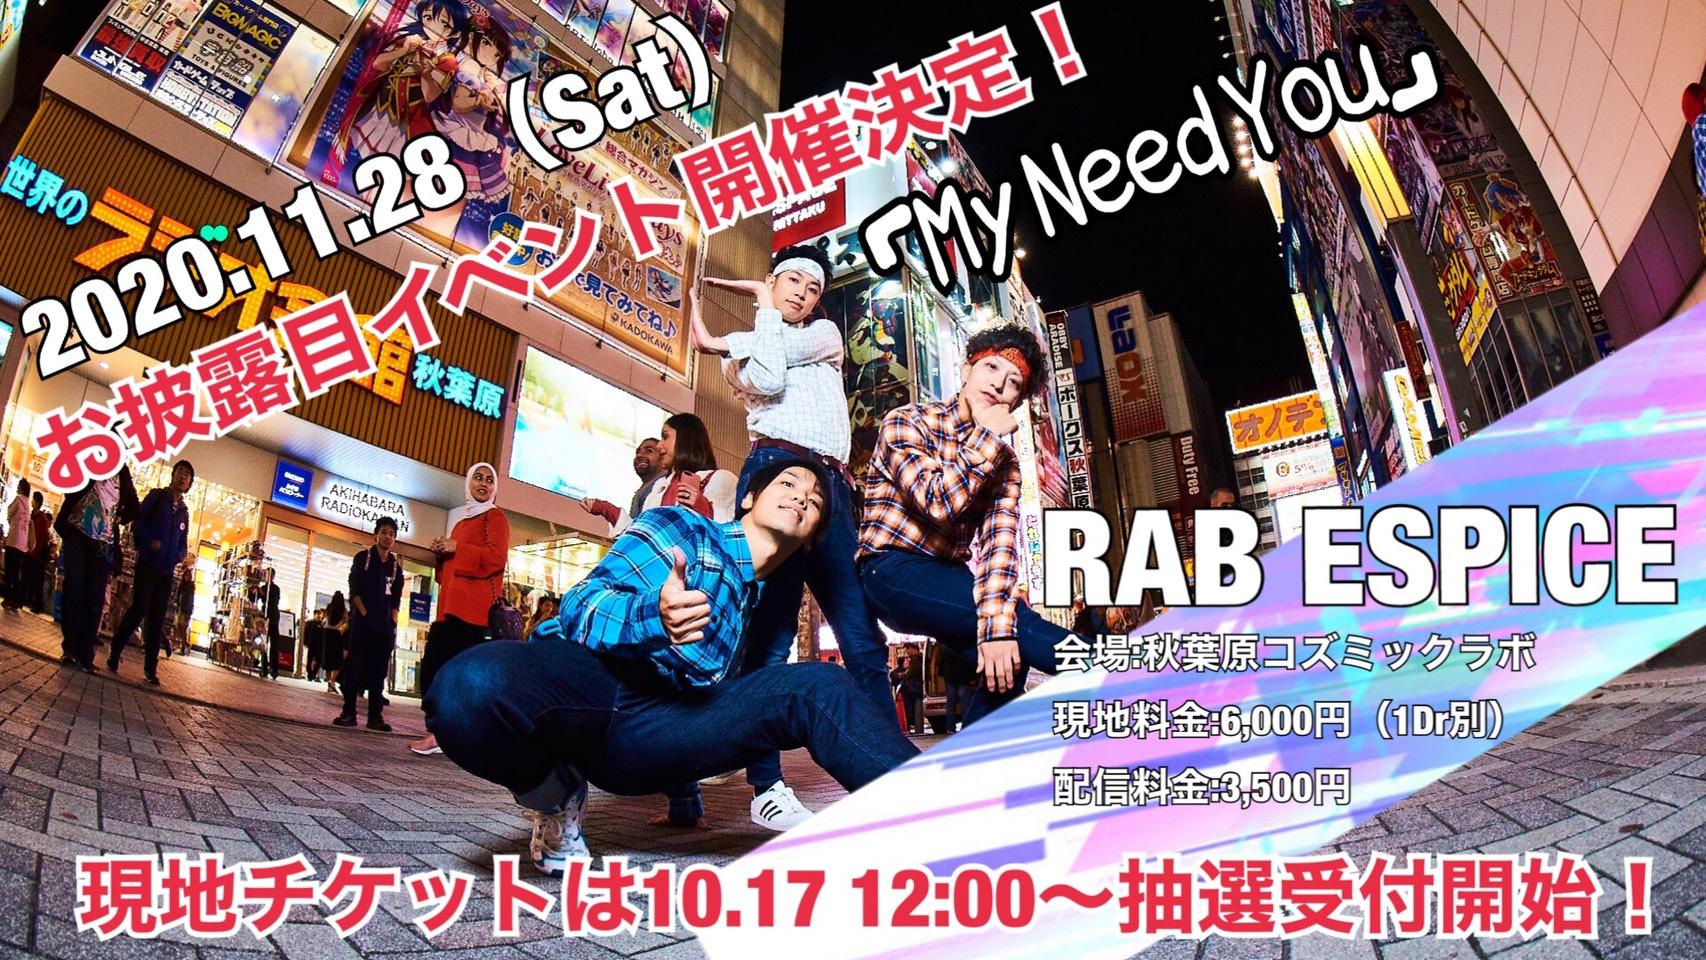 RAB ESPICE お披露目イベント「My Need You」